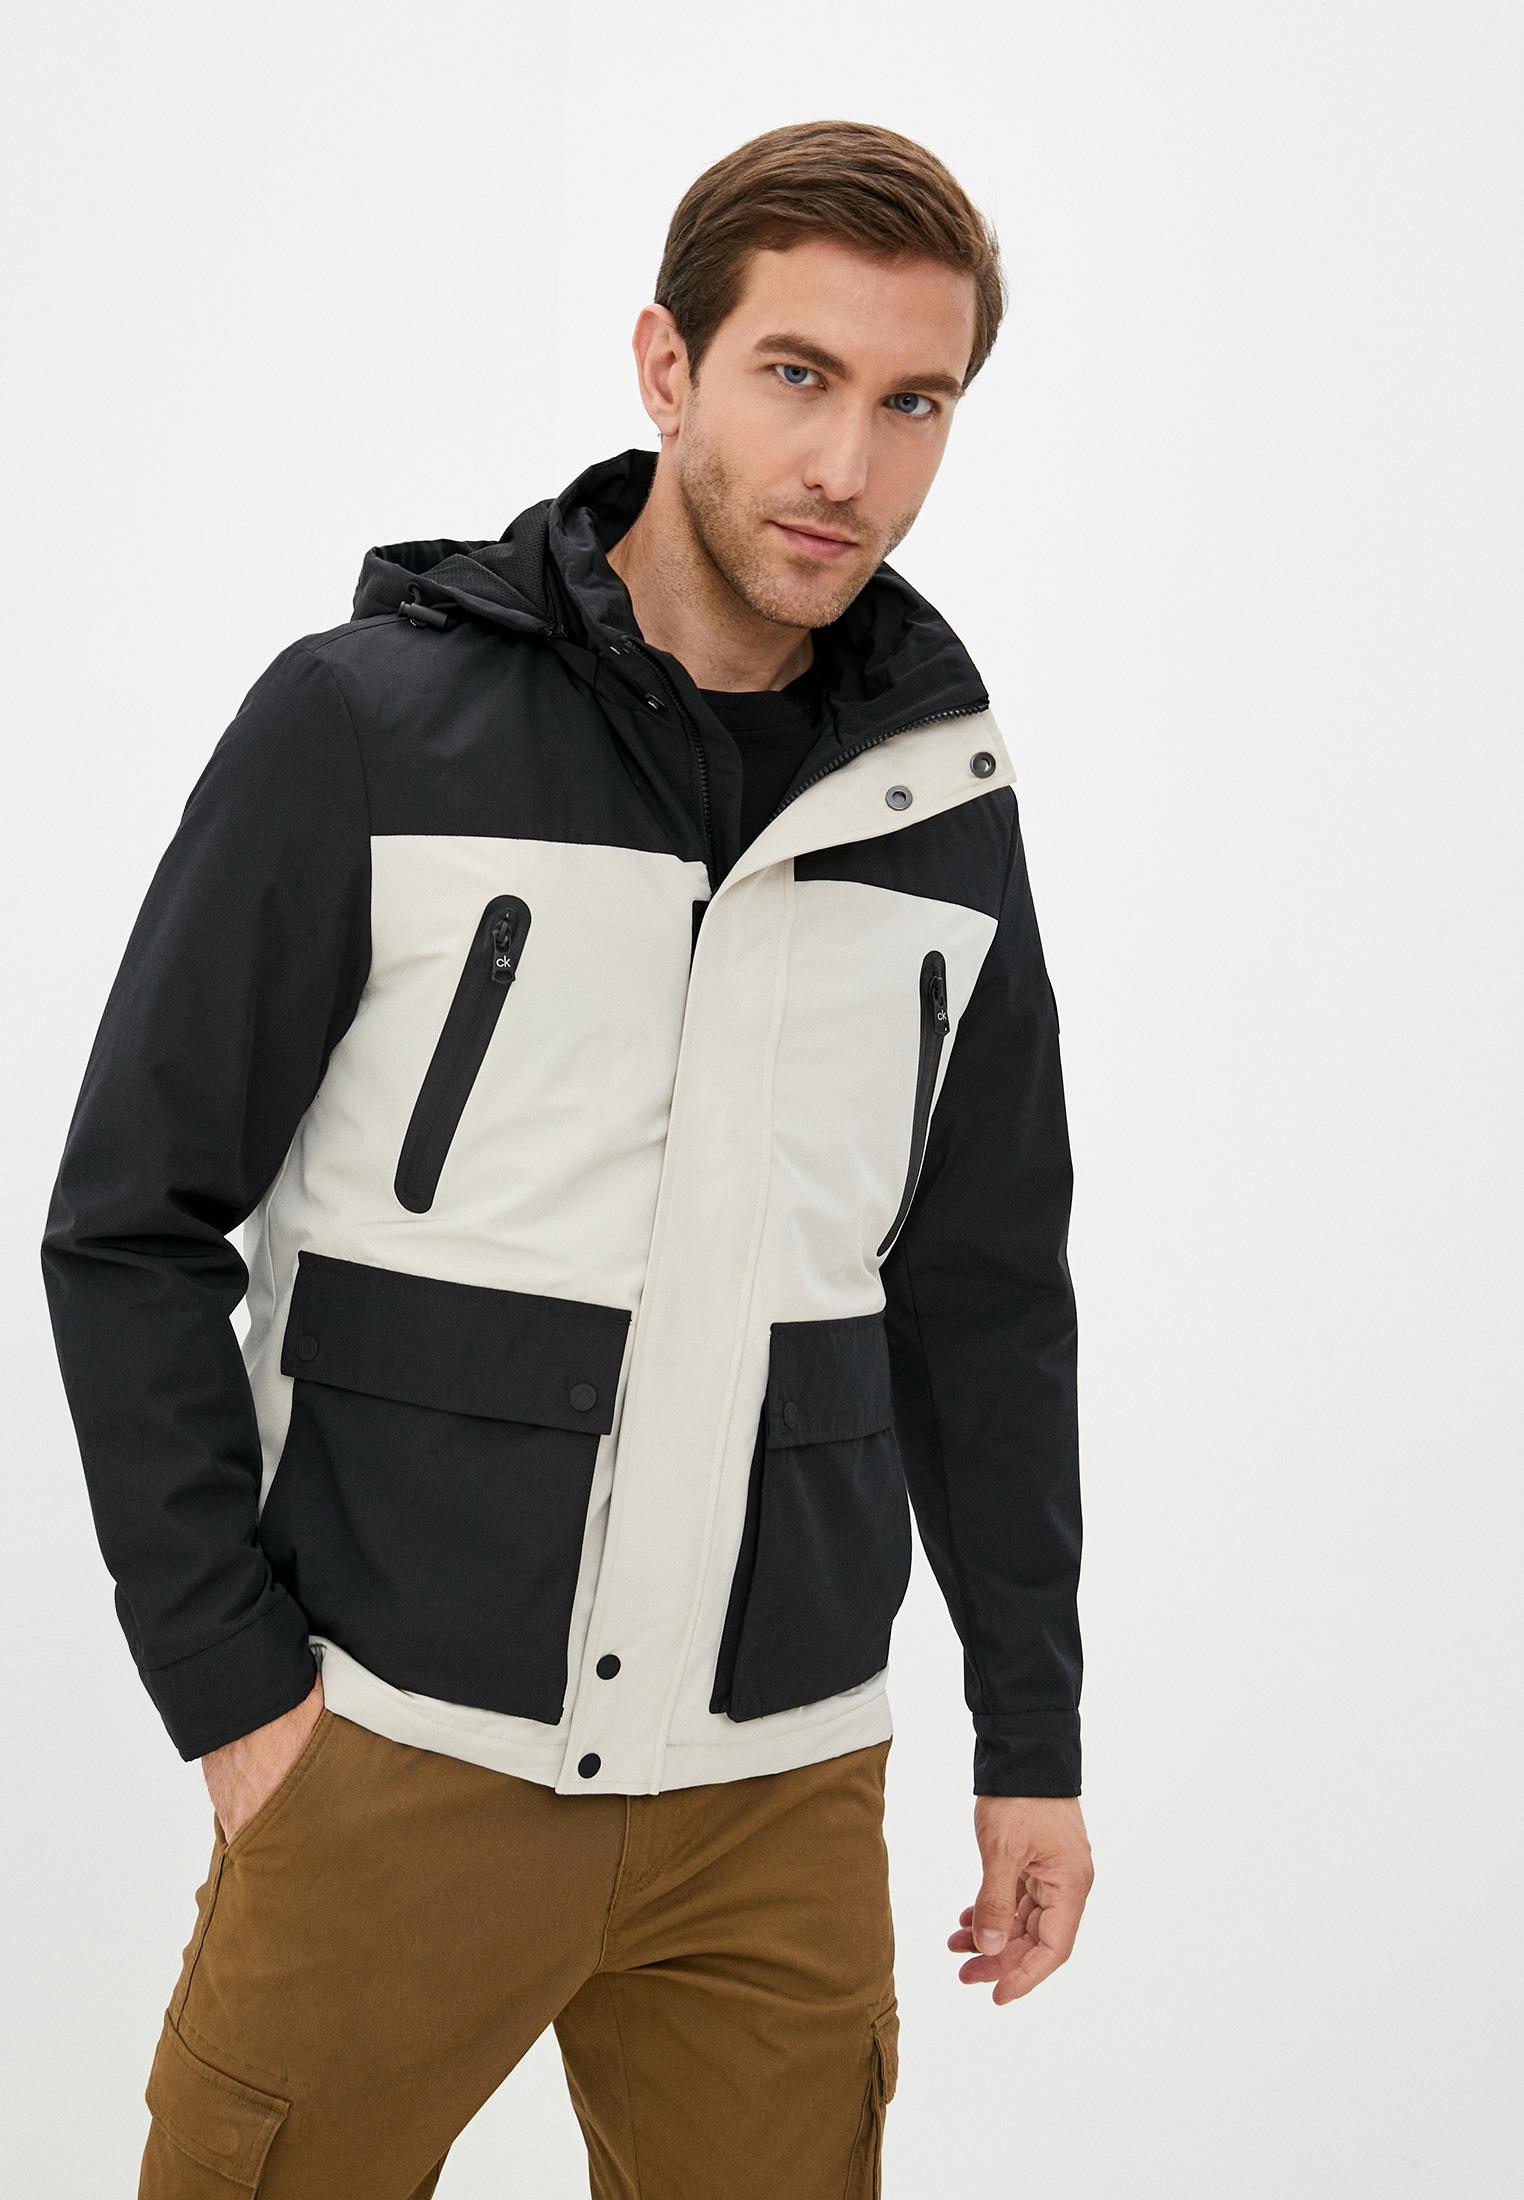 Куртка Calvin Klein (Кельвин Кляйн) Куртка утепленная Calvin Klein